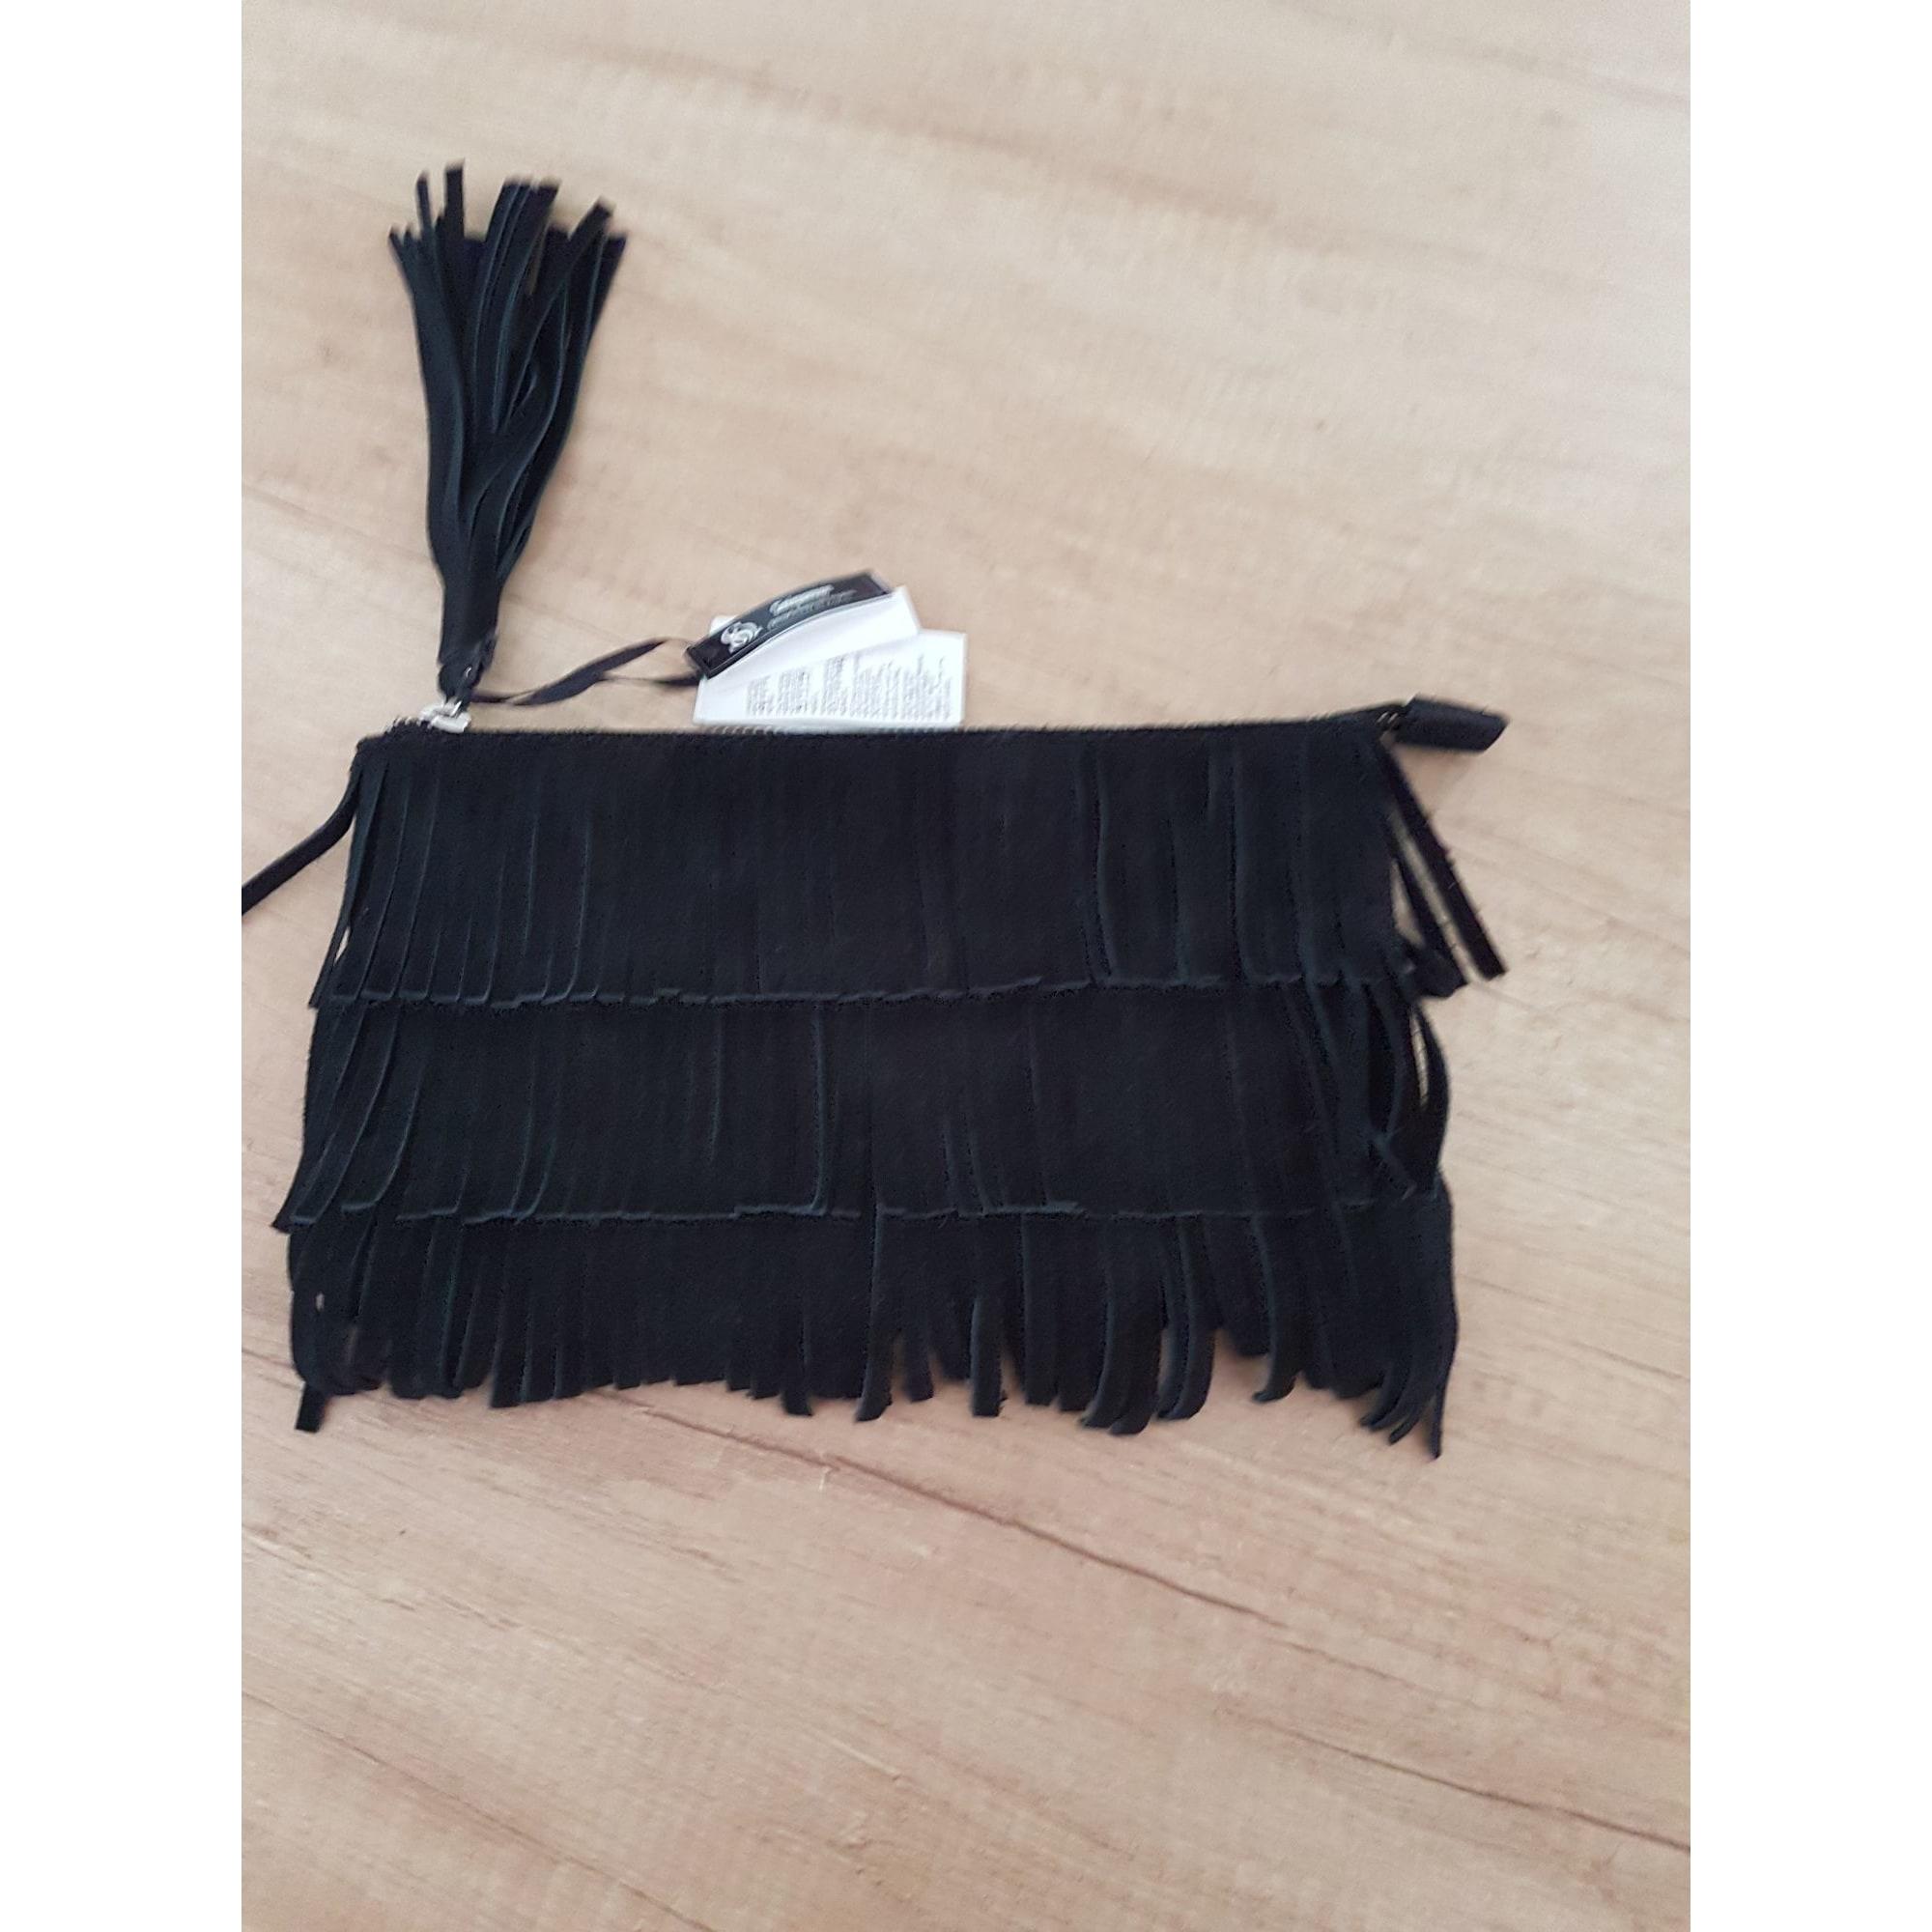 Pochette SINÉQUANONE daim noir